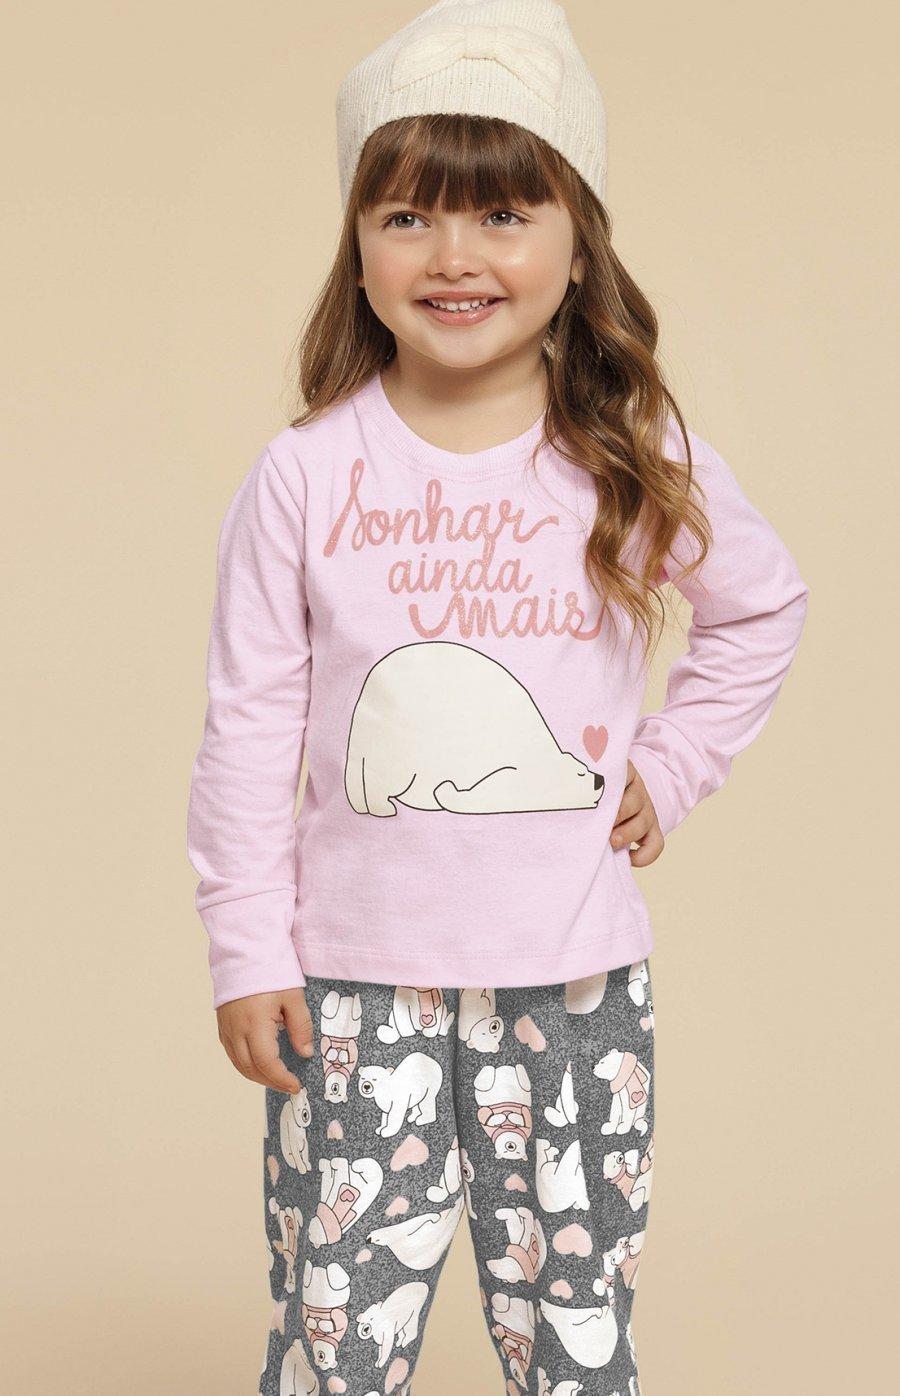 LIQUIDA Pijama Baby 100% Algodão Urso Fofolete Inverno